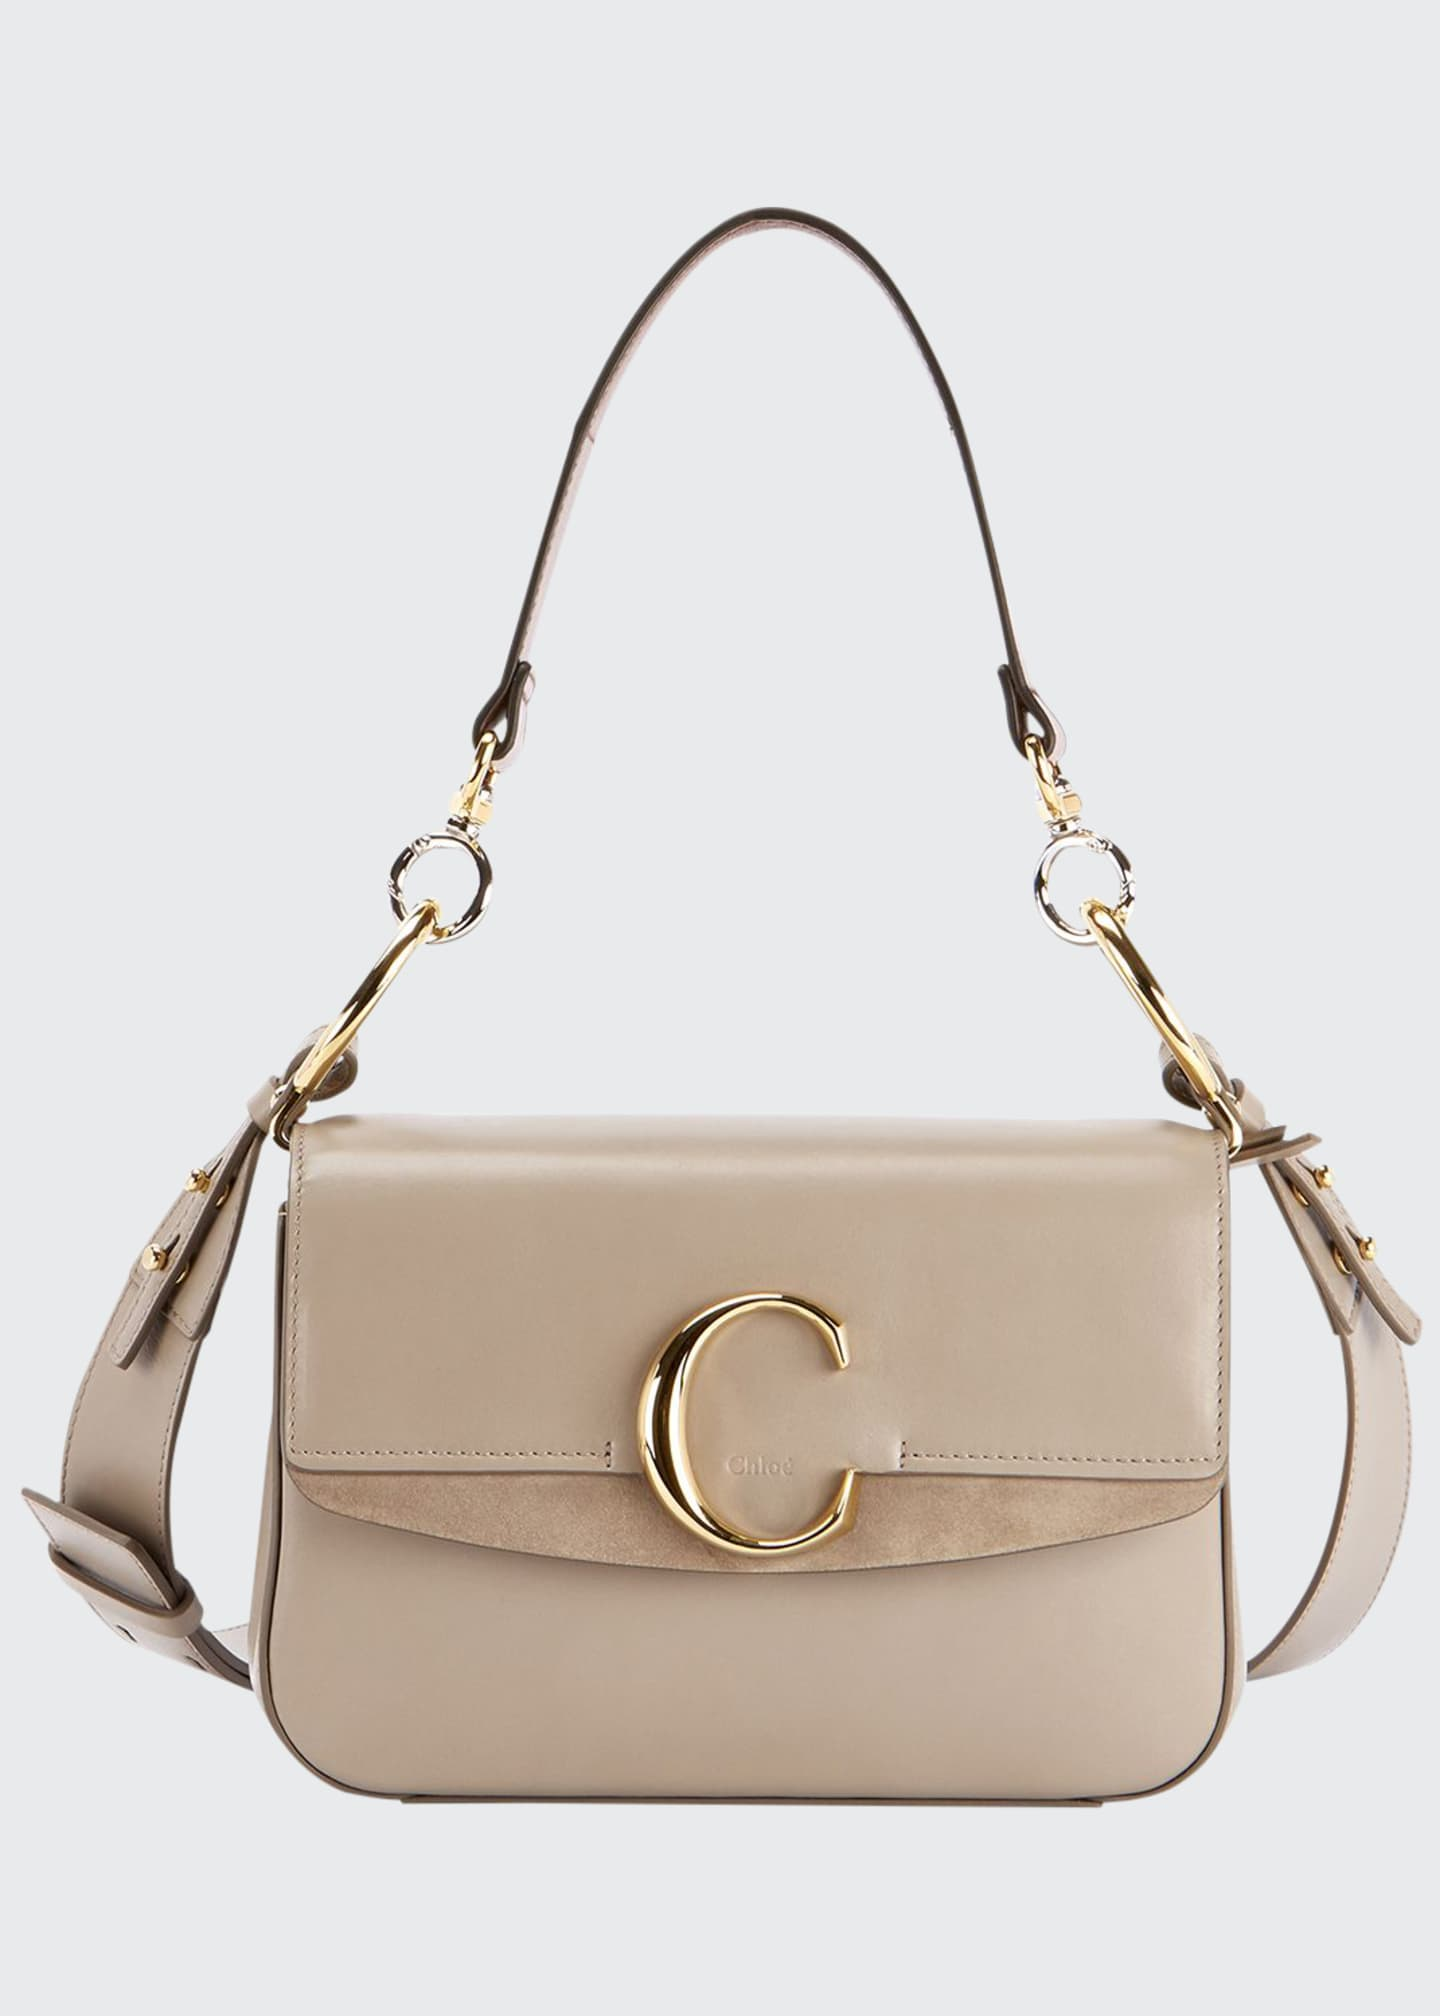 Chloe C Small Shiny Calf Leather Shoulder Bag